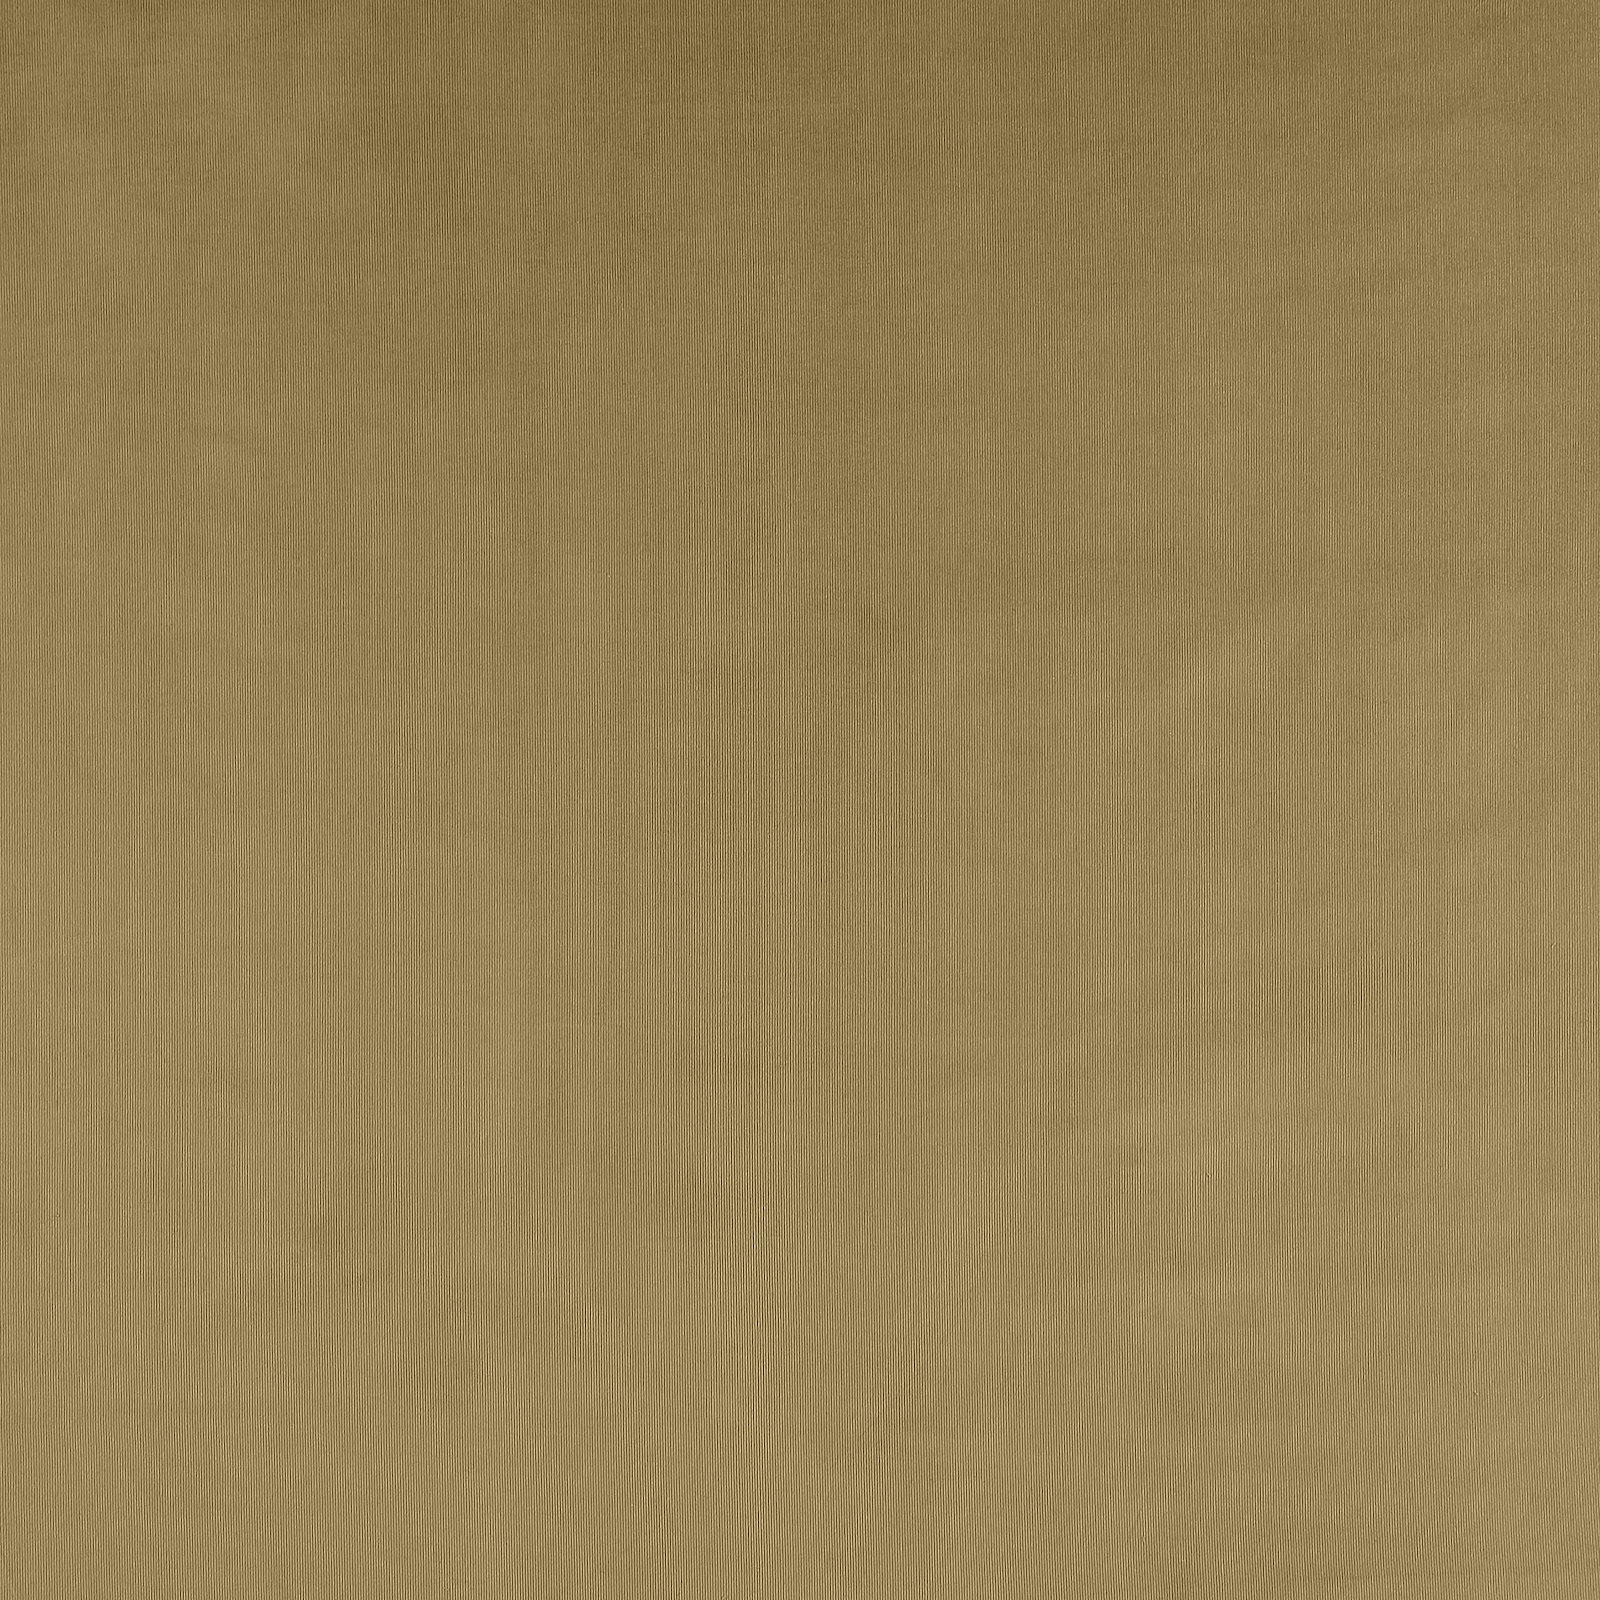 Corduroy 21 wales light khaki 430825_pack_solid